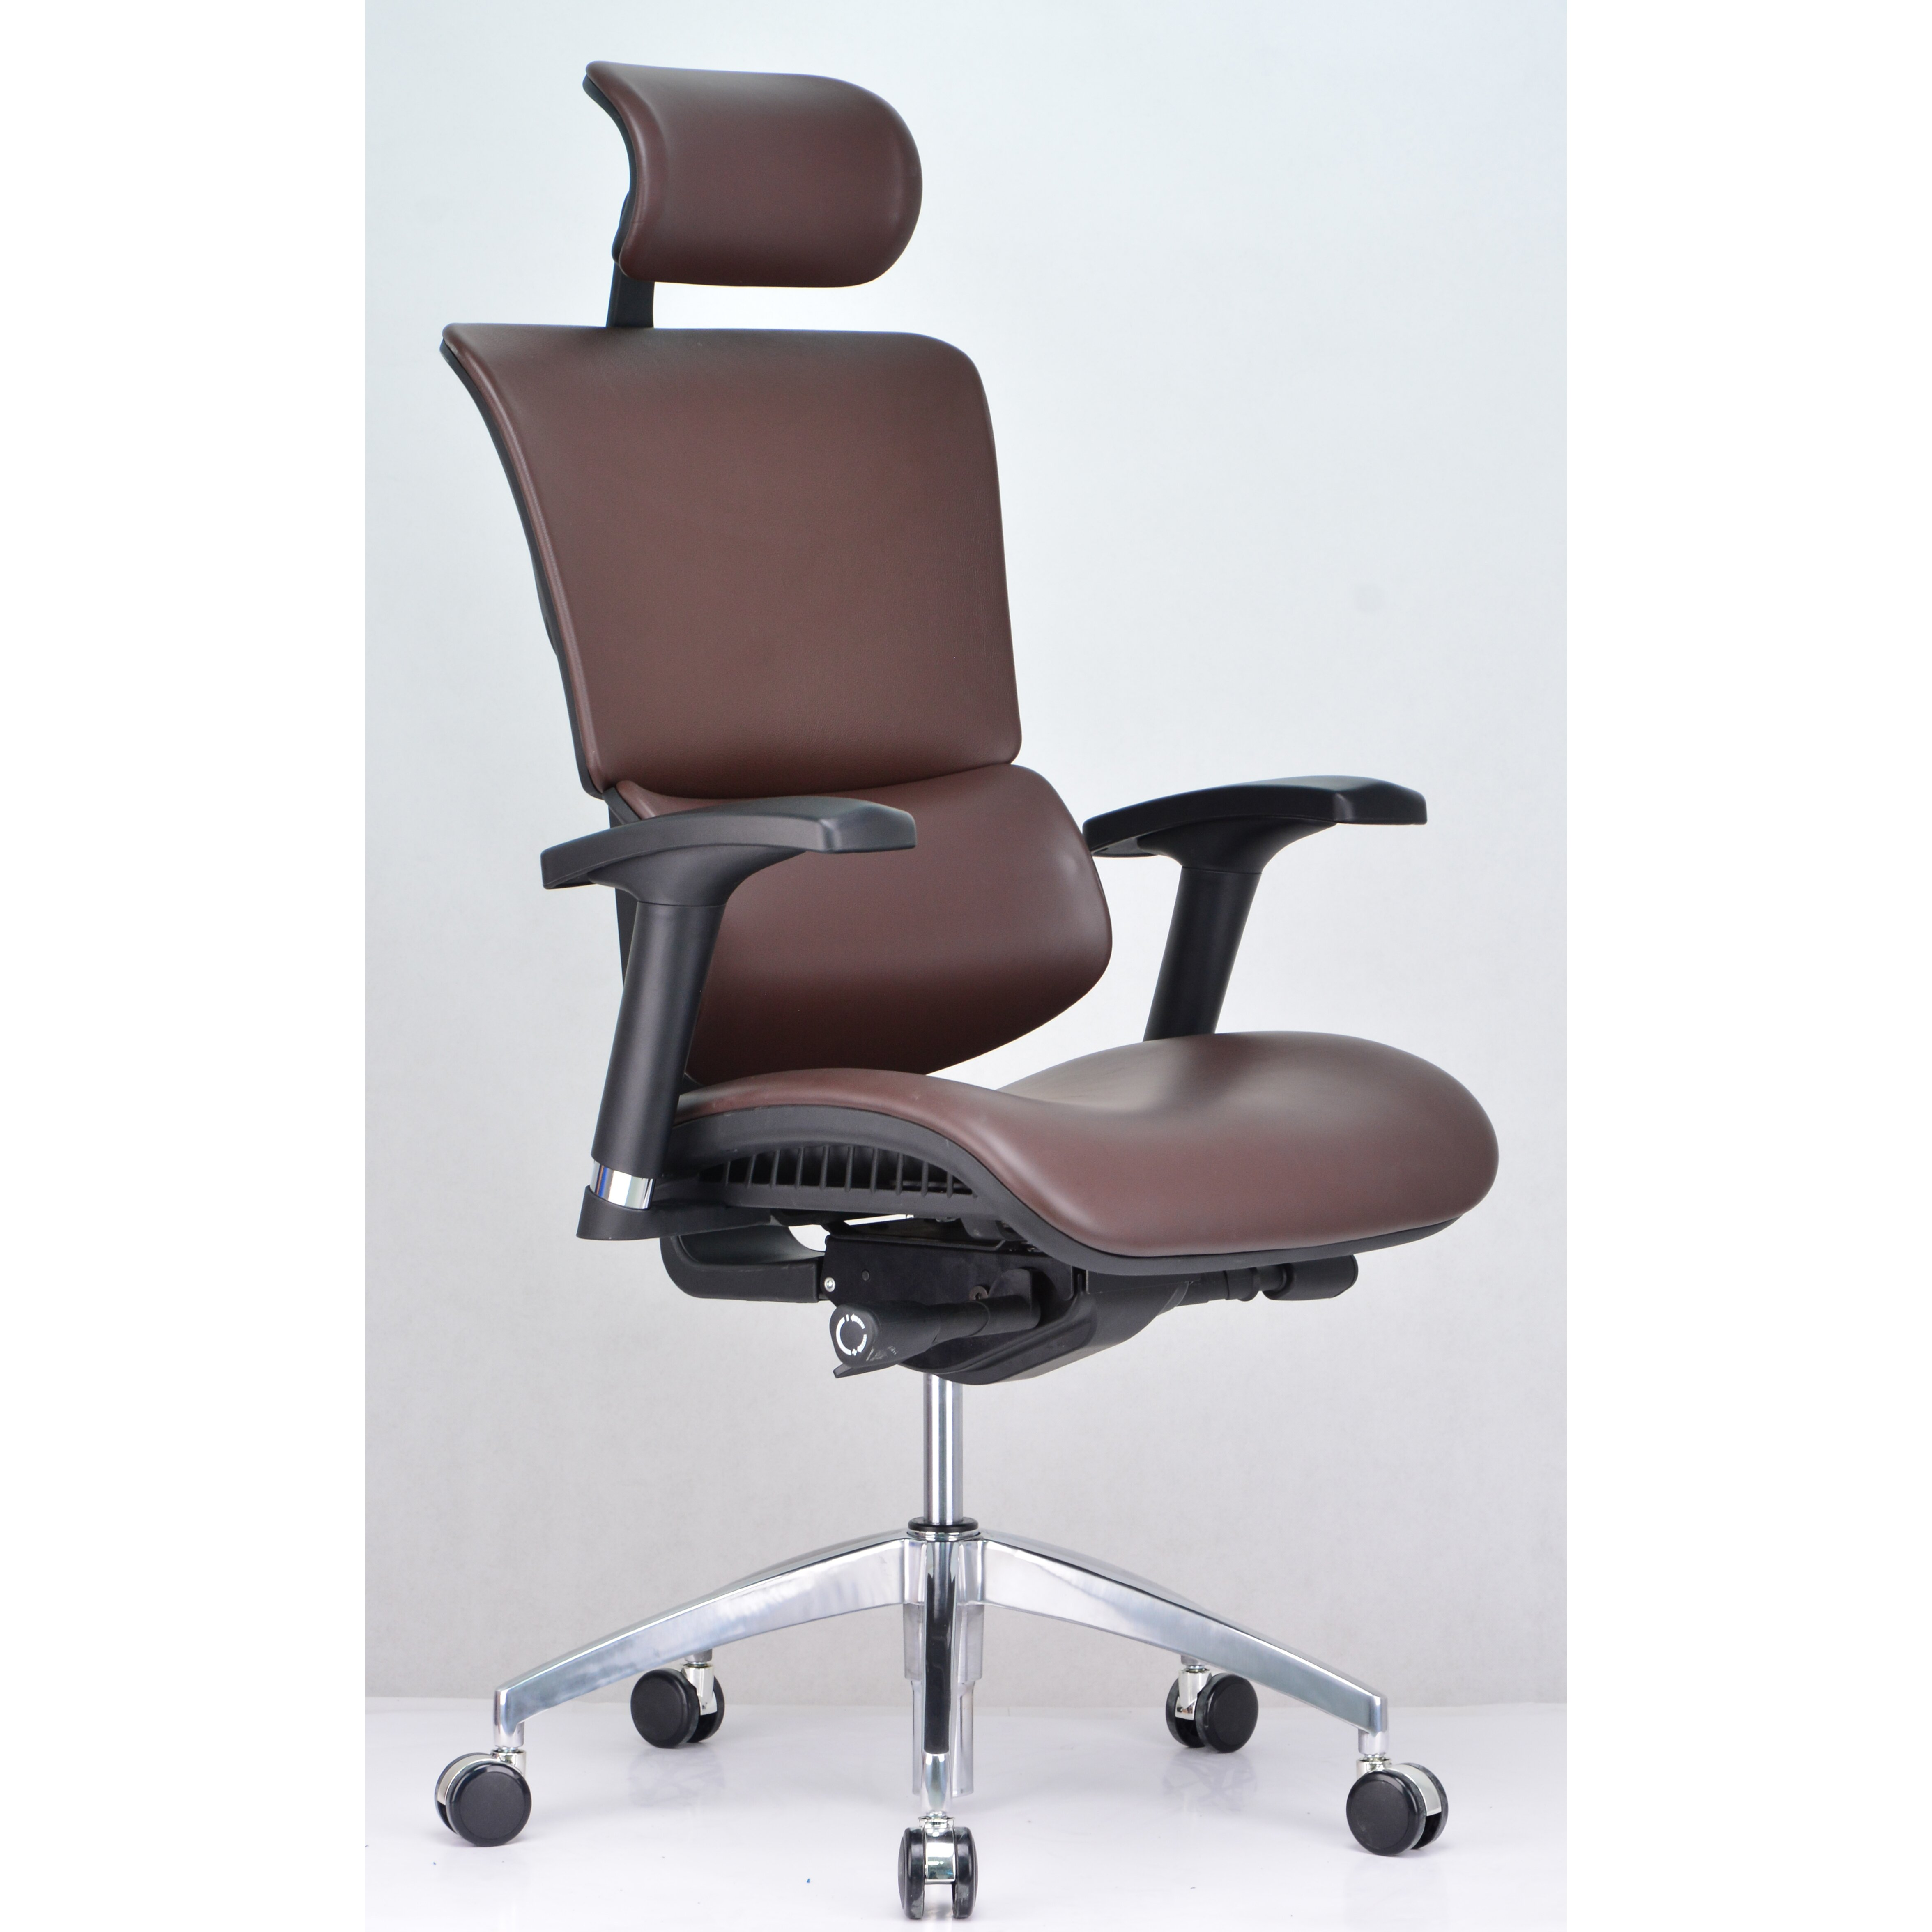 Conklin fice Furniture Vito High Back Leather Executive